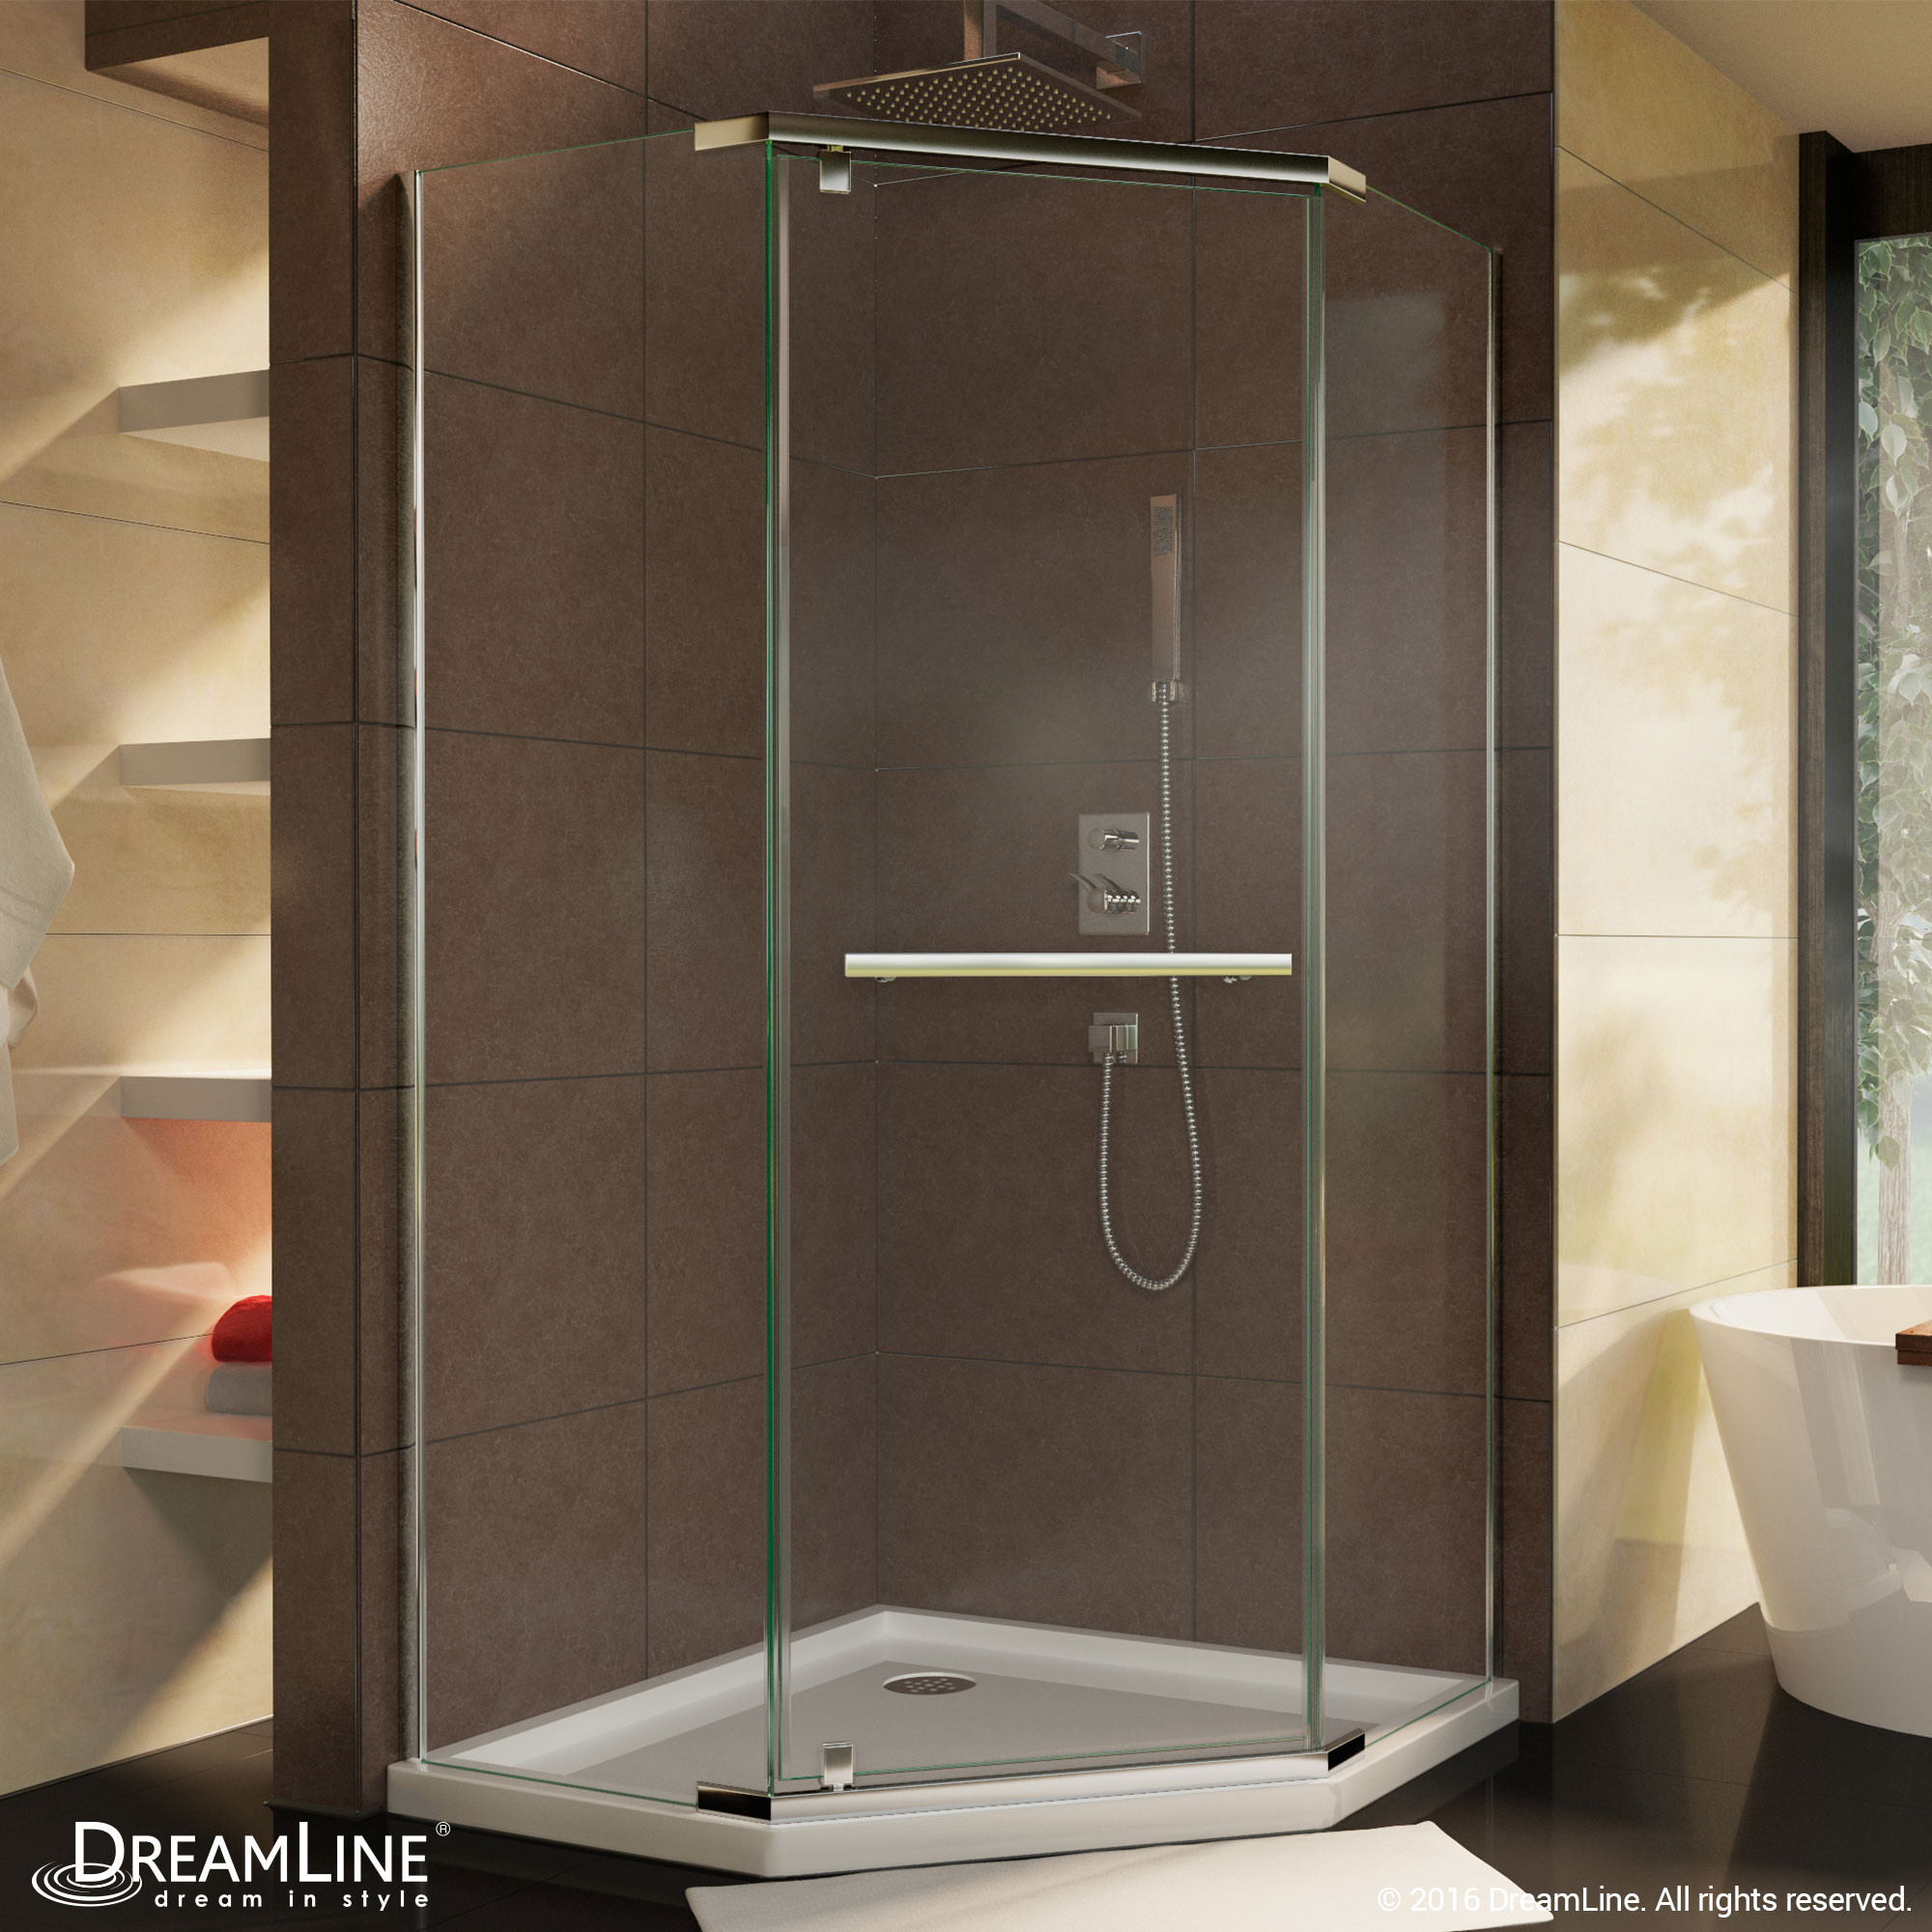 DreamLine SHEN-2138380-01 Chrome Prism 38-1/8 in. W x 38-1/8 in. D x 72 in. H Pivot Shower Enclosure